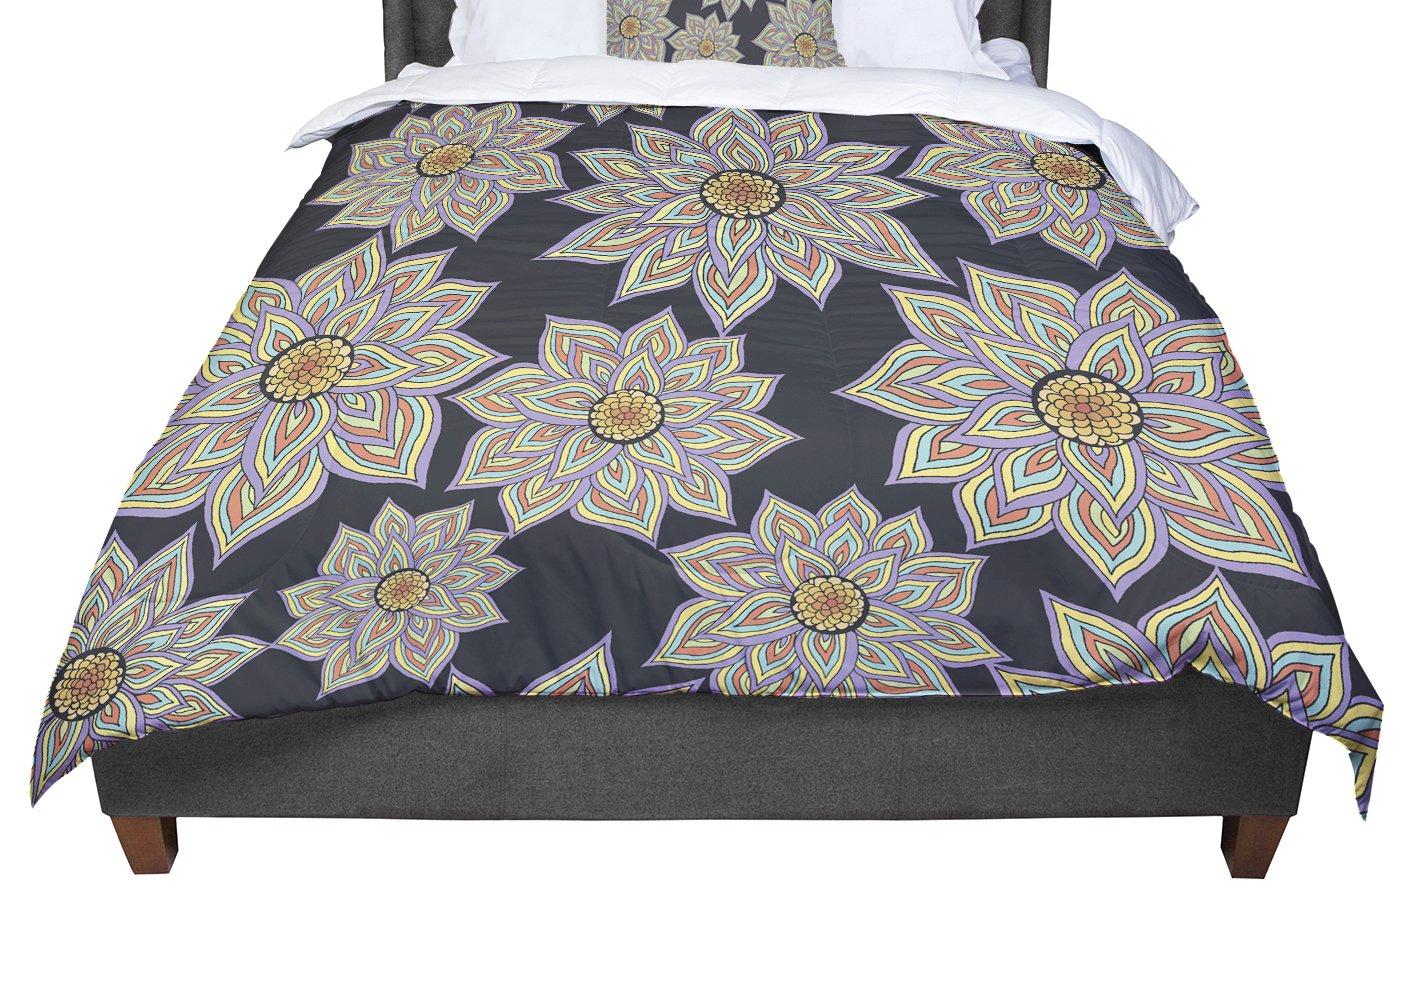 KESS InHouse Pom Graphic Design ''Floral Dance In The Dark'' King / Cal King Comforter, 104'' X 88''